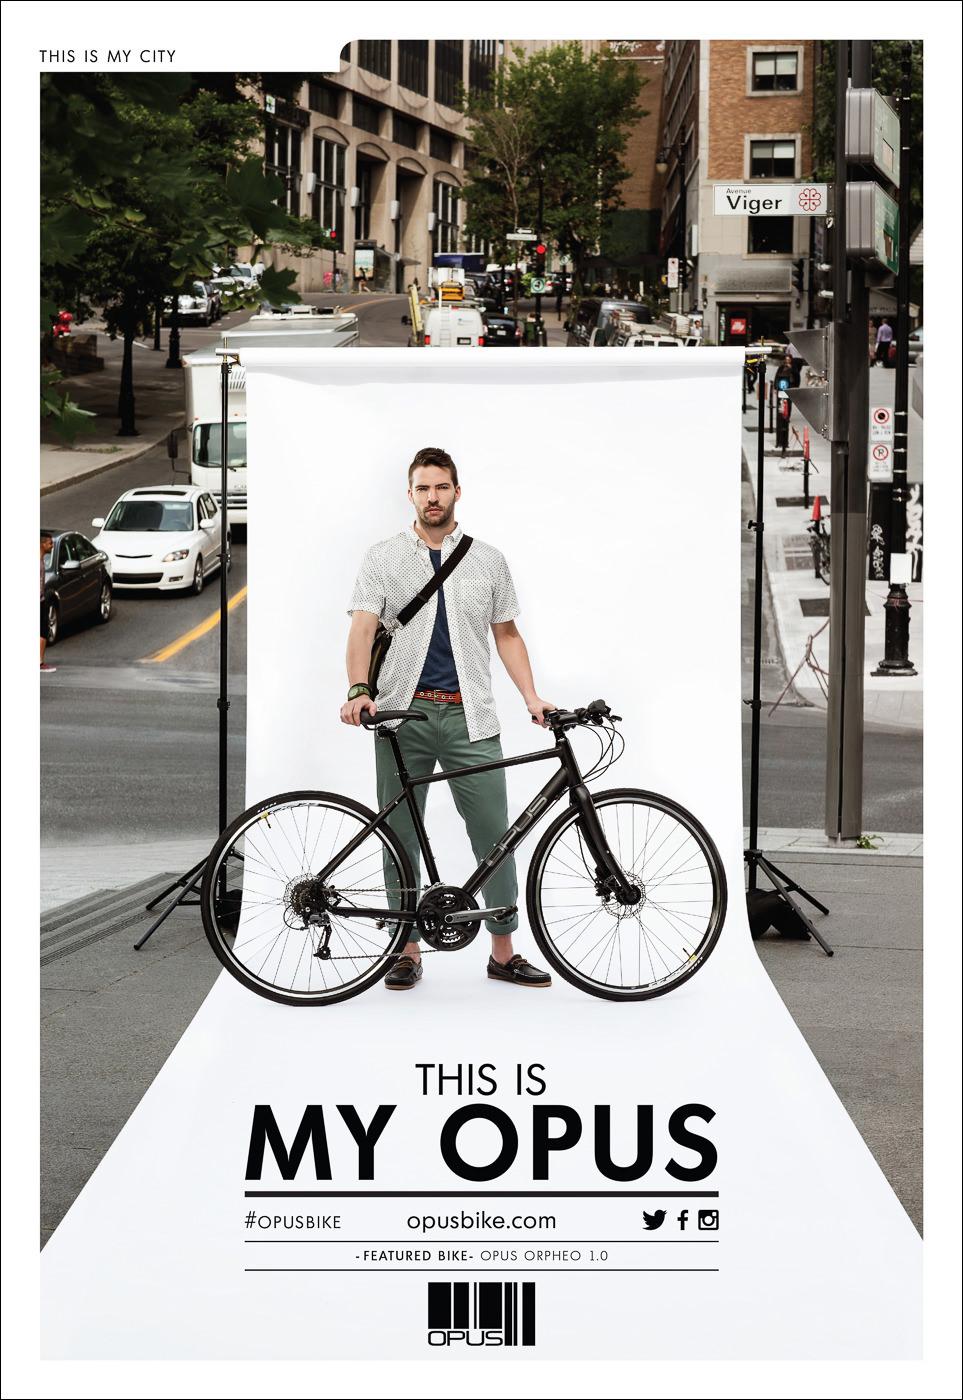 campagne publicite my opus velo hybride orpheo 1.0 urbain